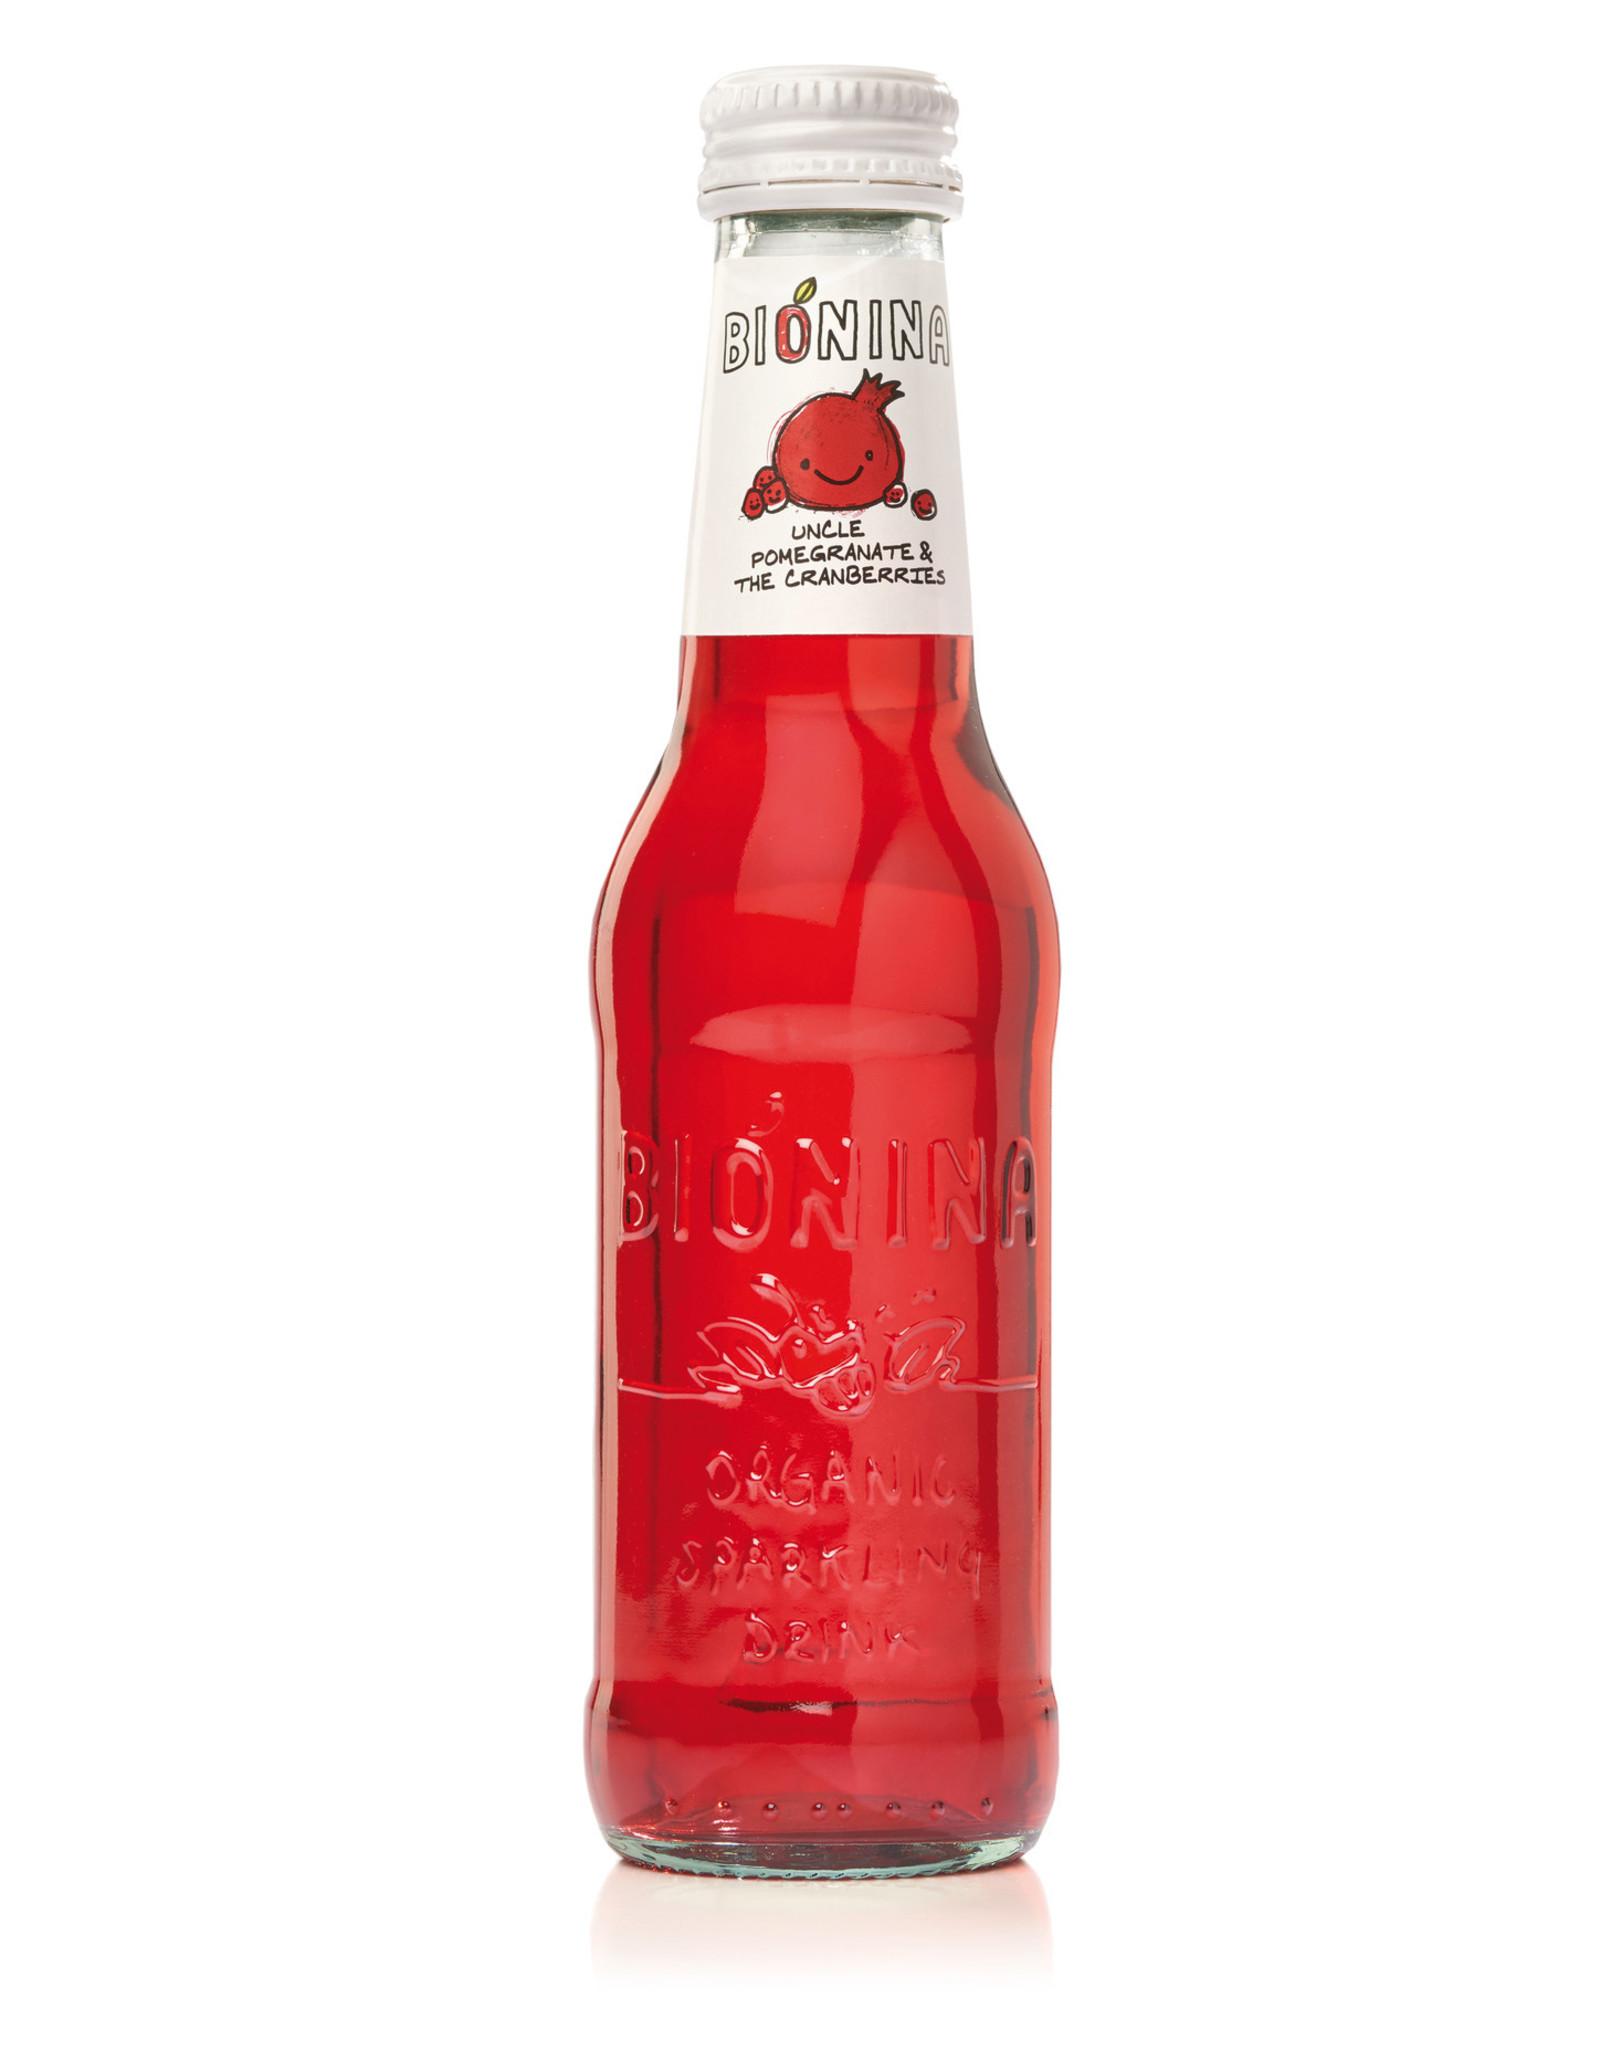 Bionina Bionina flesje Uncle Pomegranate The Cranberries 200ml